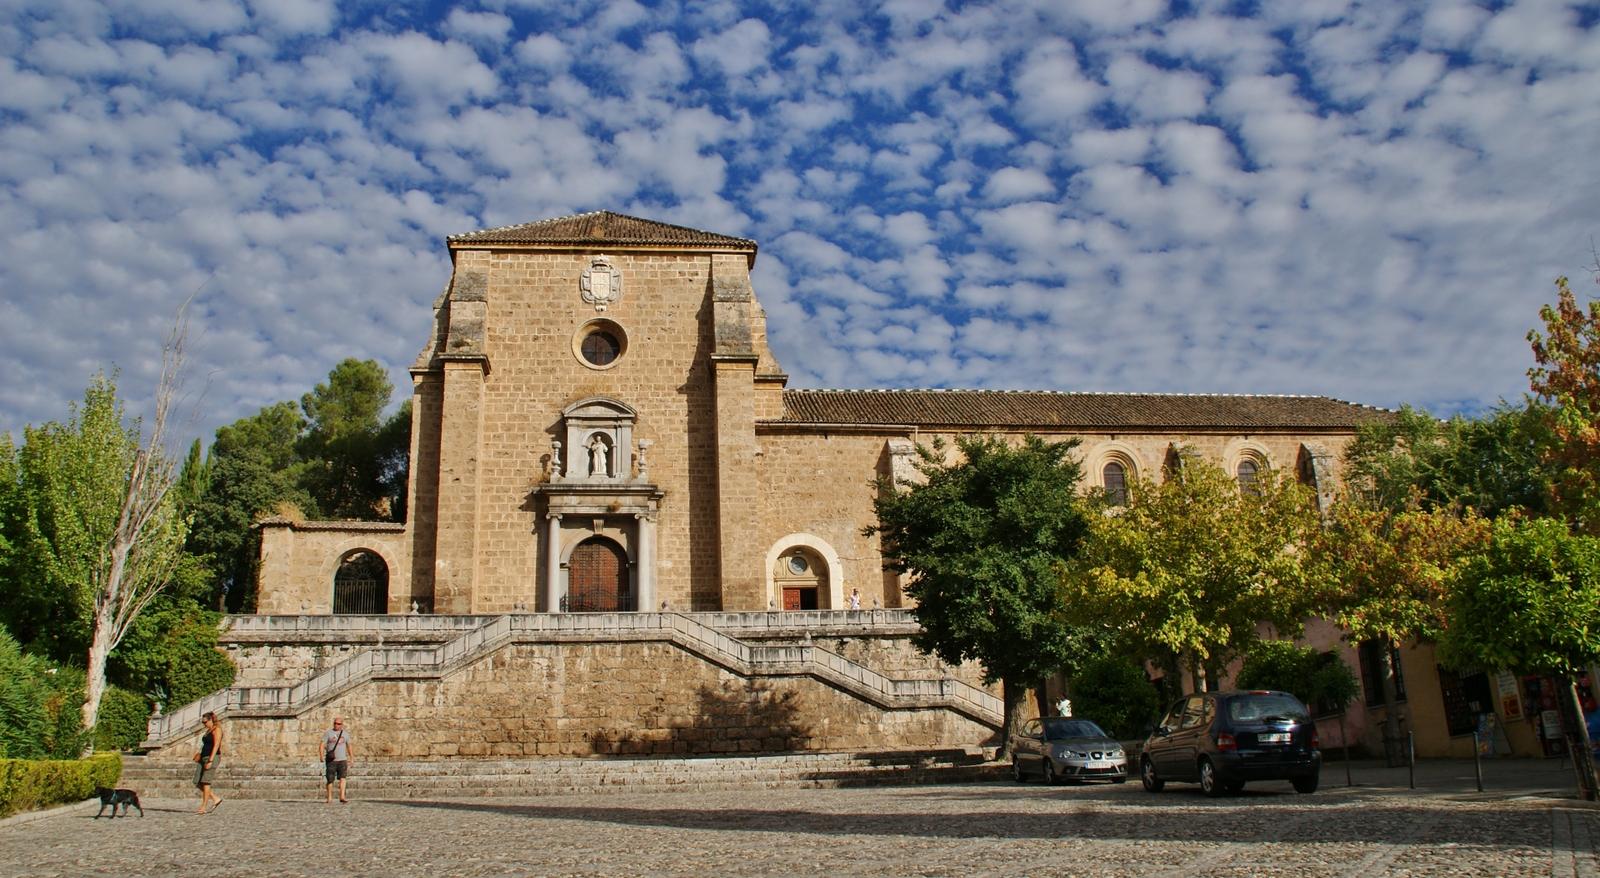 Monasterio-de-la-Cartuja-de-Granada_wikipedia